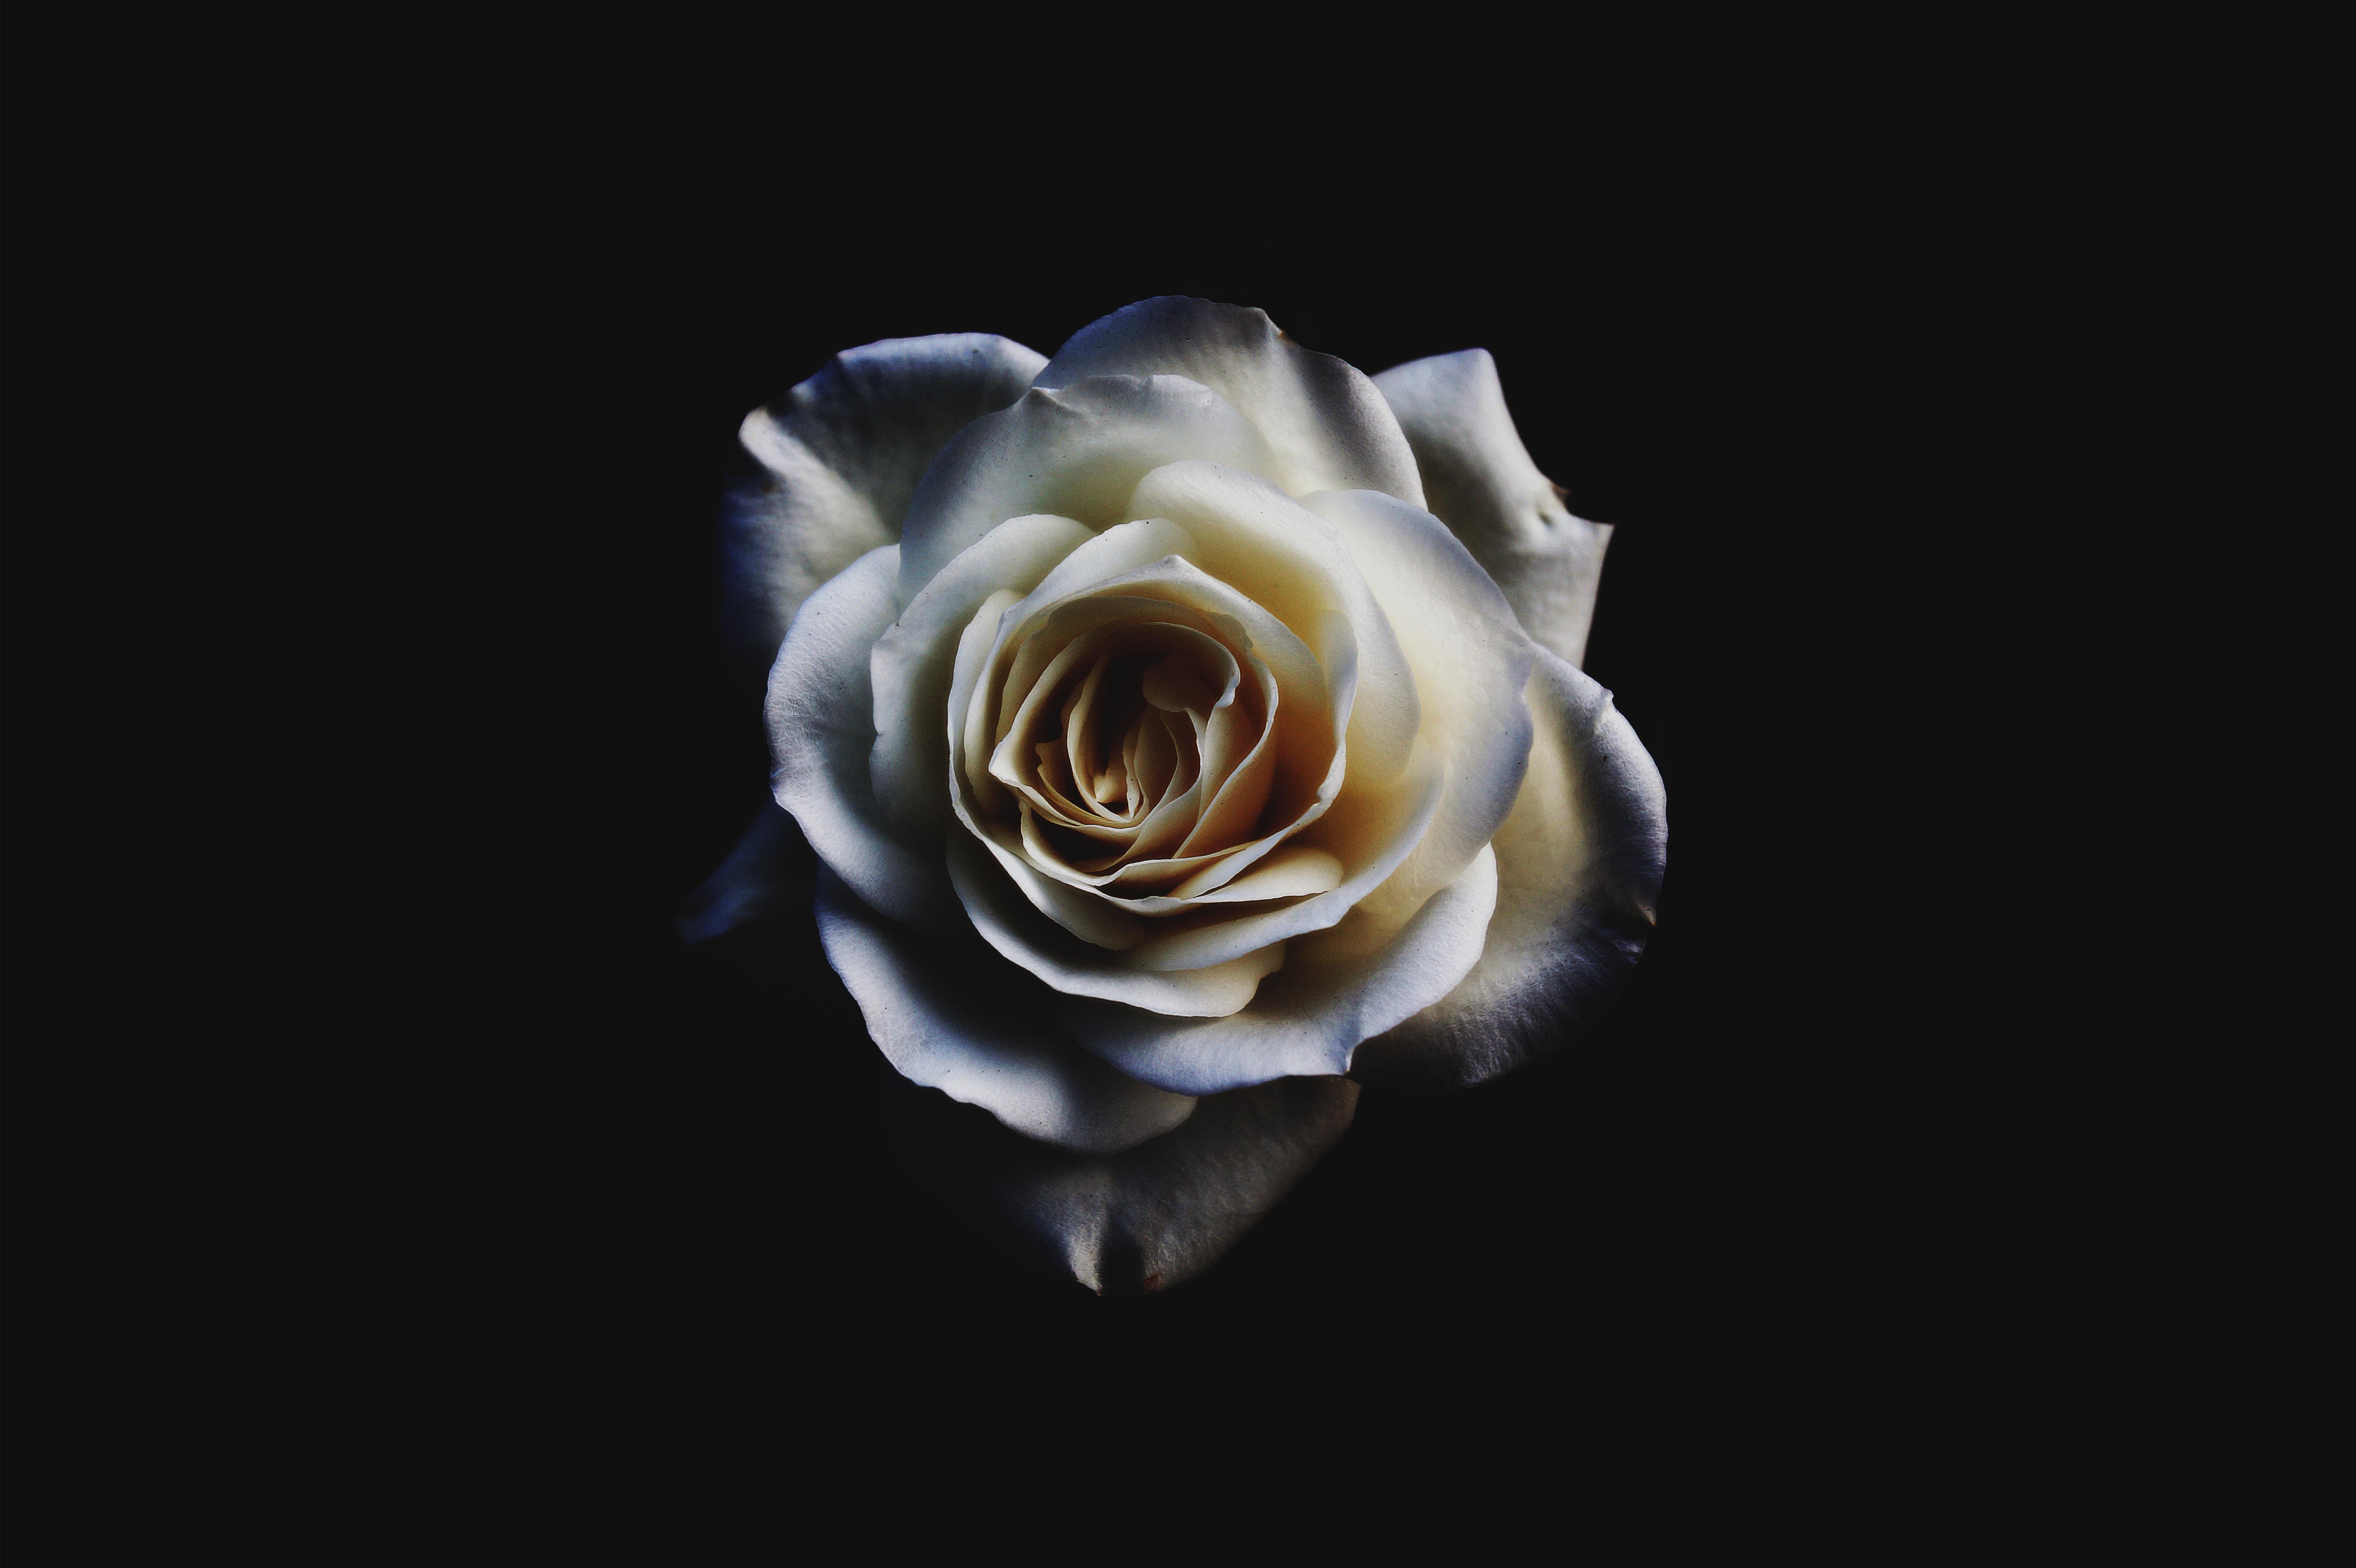 closeup of white rose